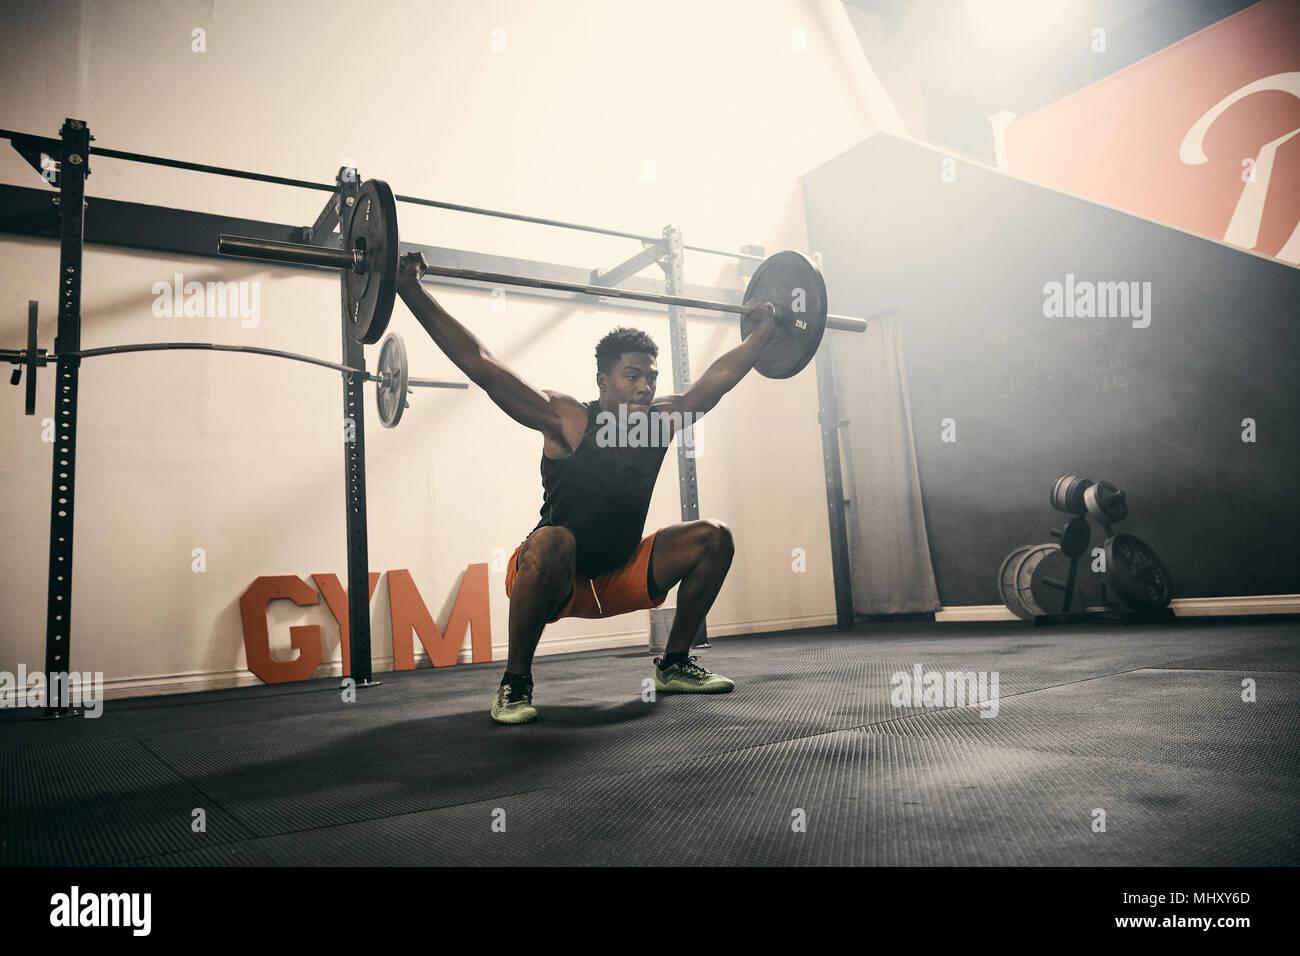 Hombre en gimnasio con pesas barbell Imagen De Stock